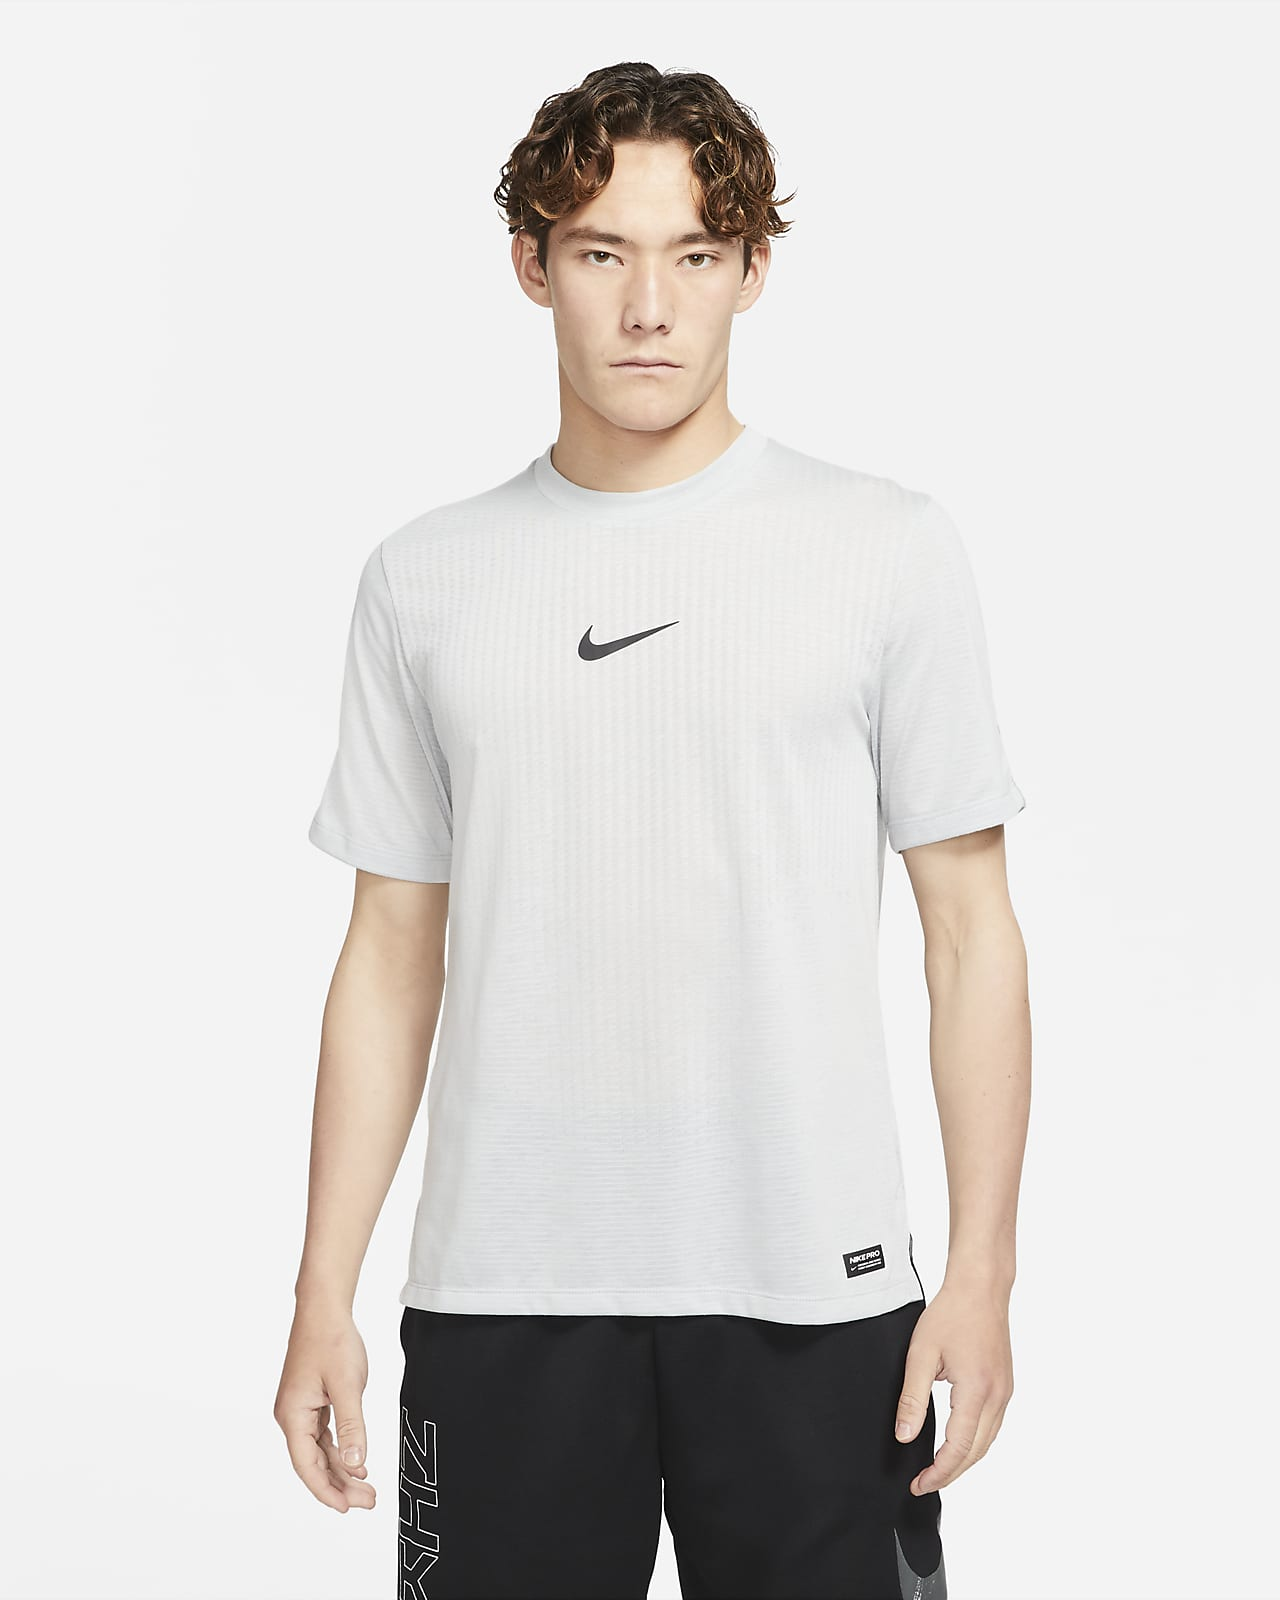 Nike Pro Dri-FIT ADV 男款短袖上衣